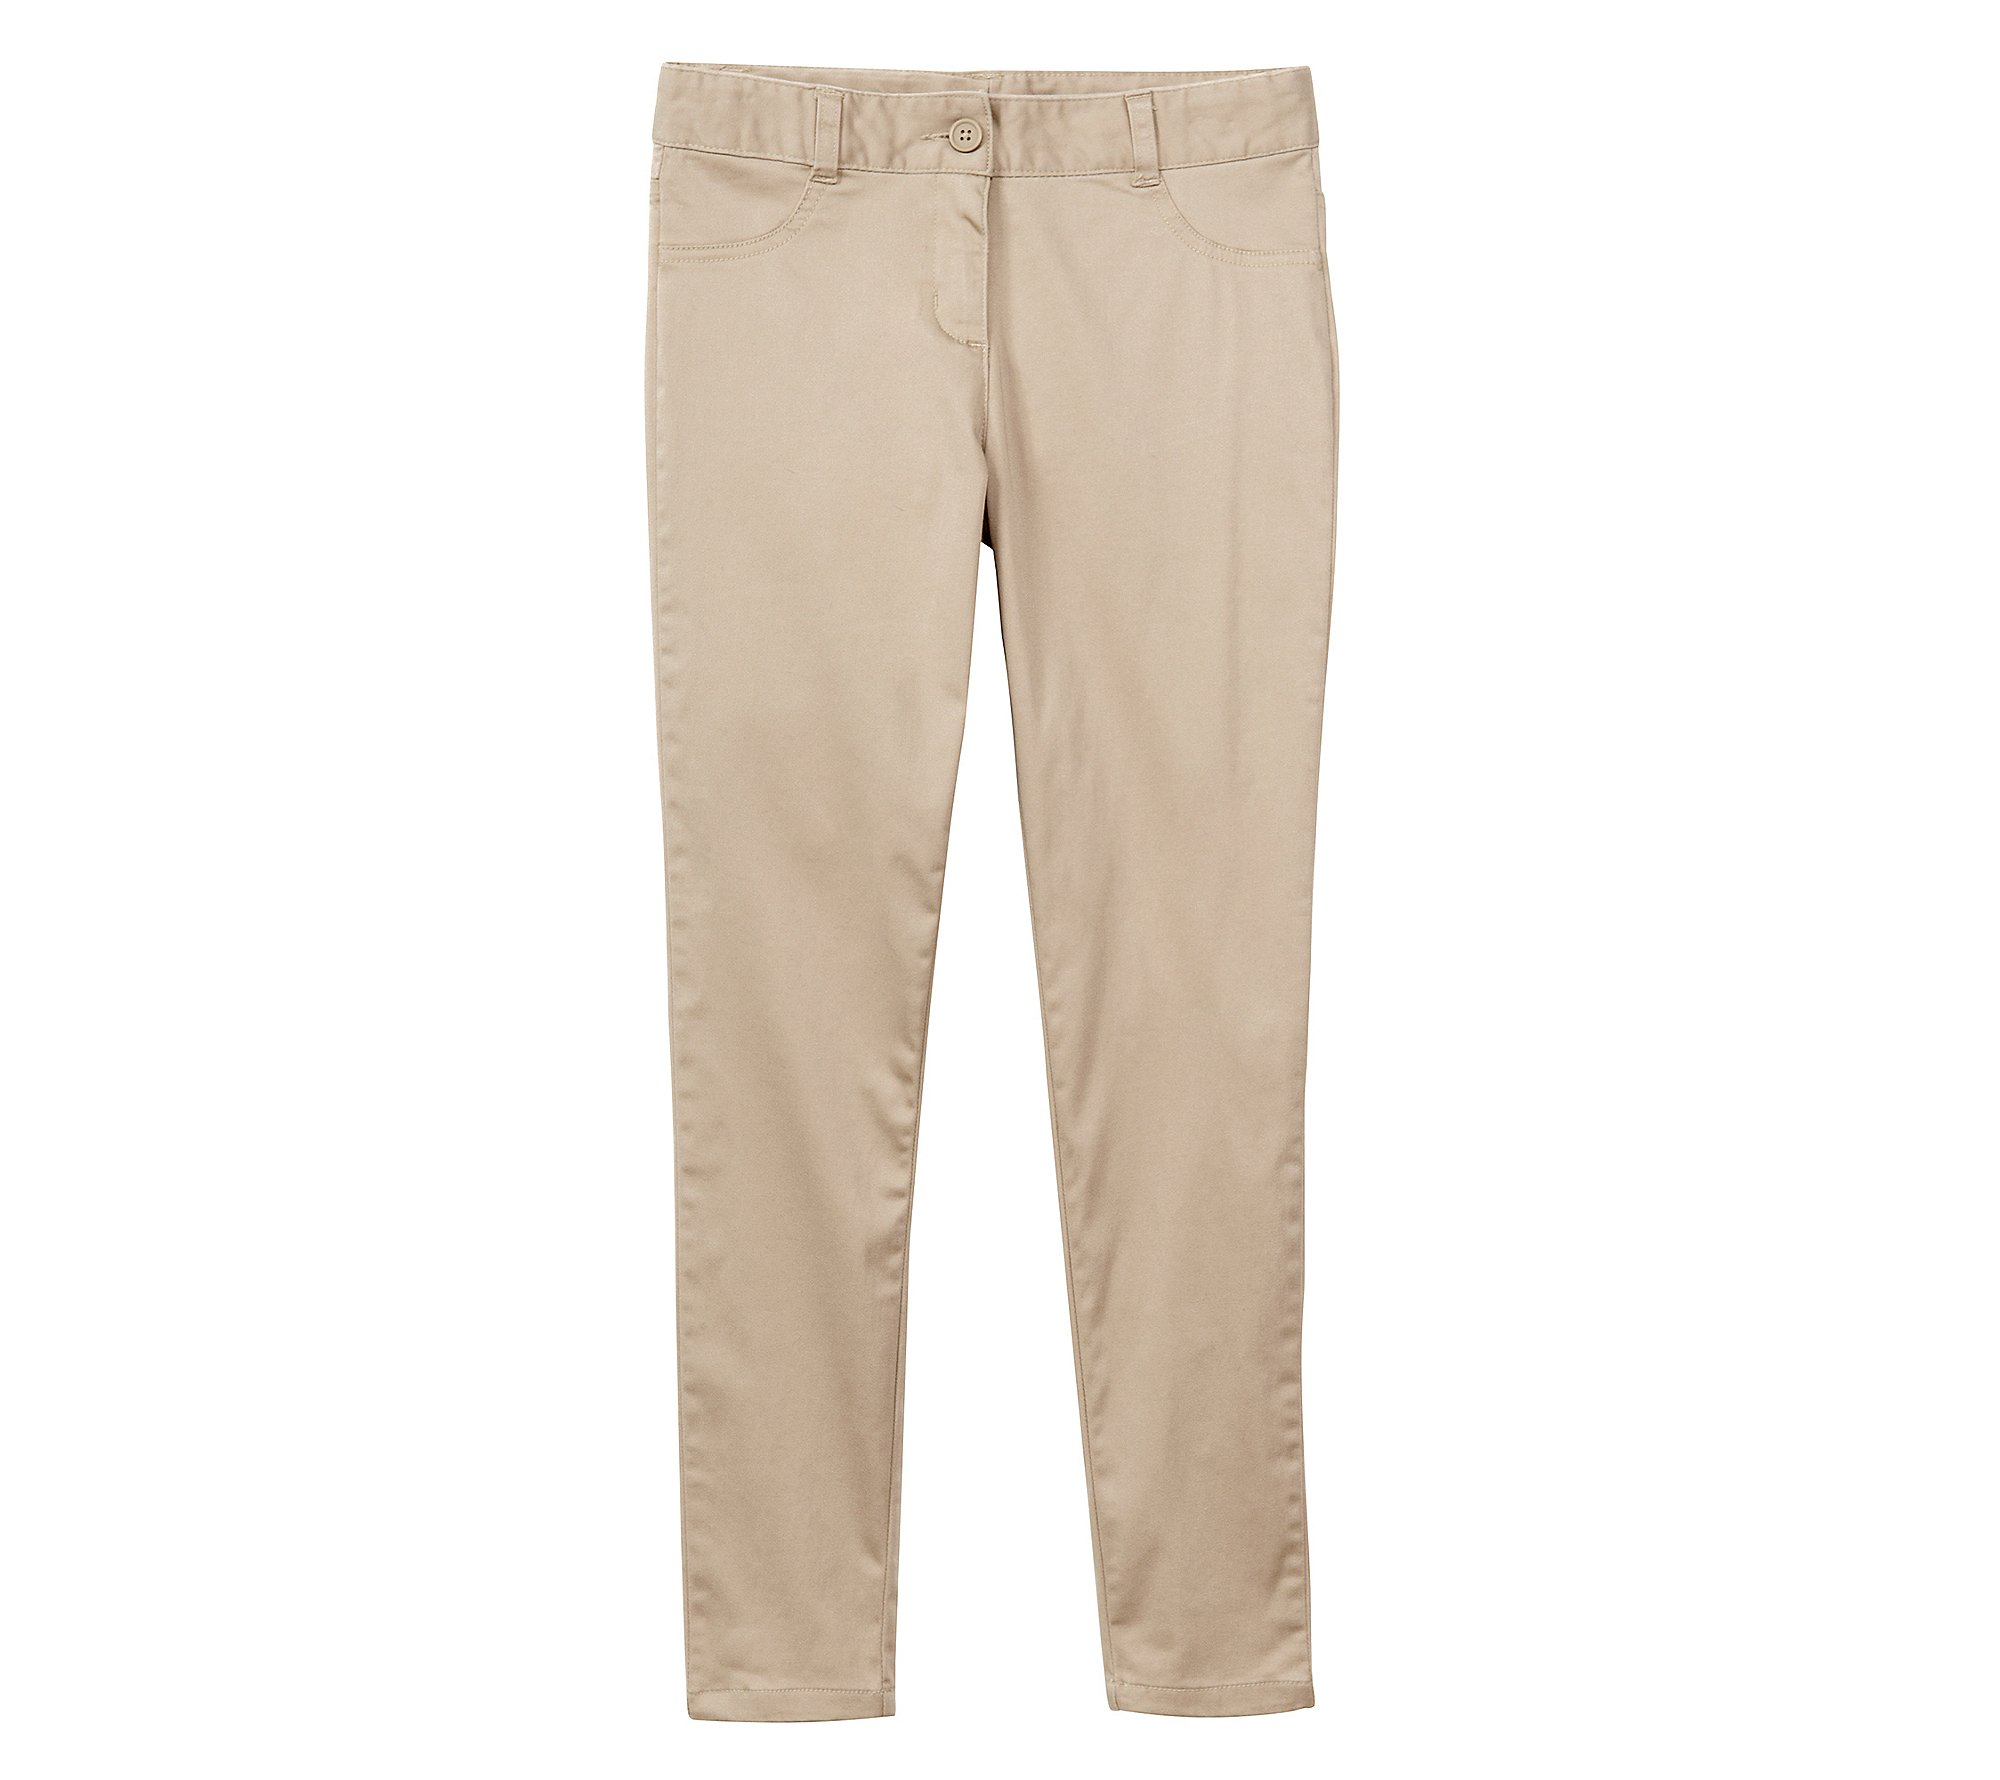 Nautica Girls' 7-16 5-Pocket Sateen Pants Summer Khaki 14 Regular